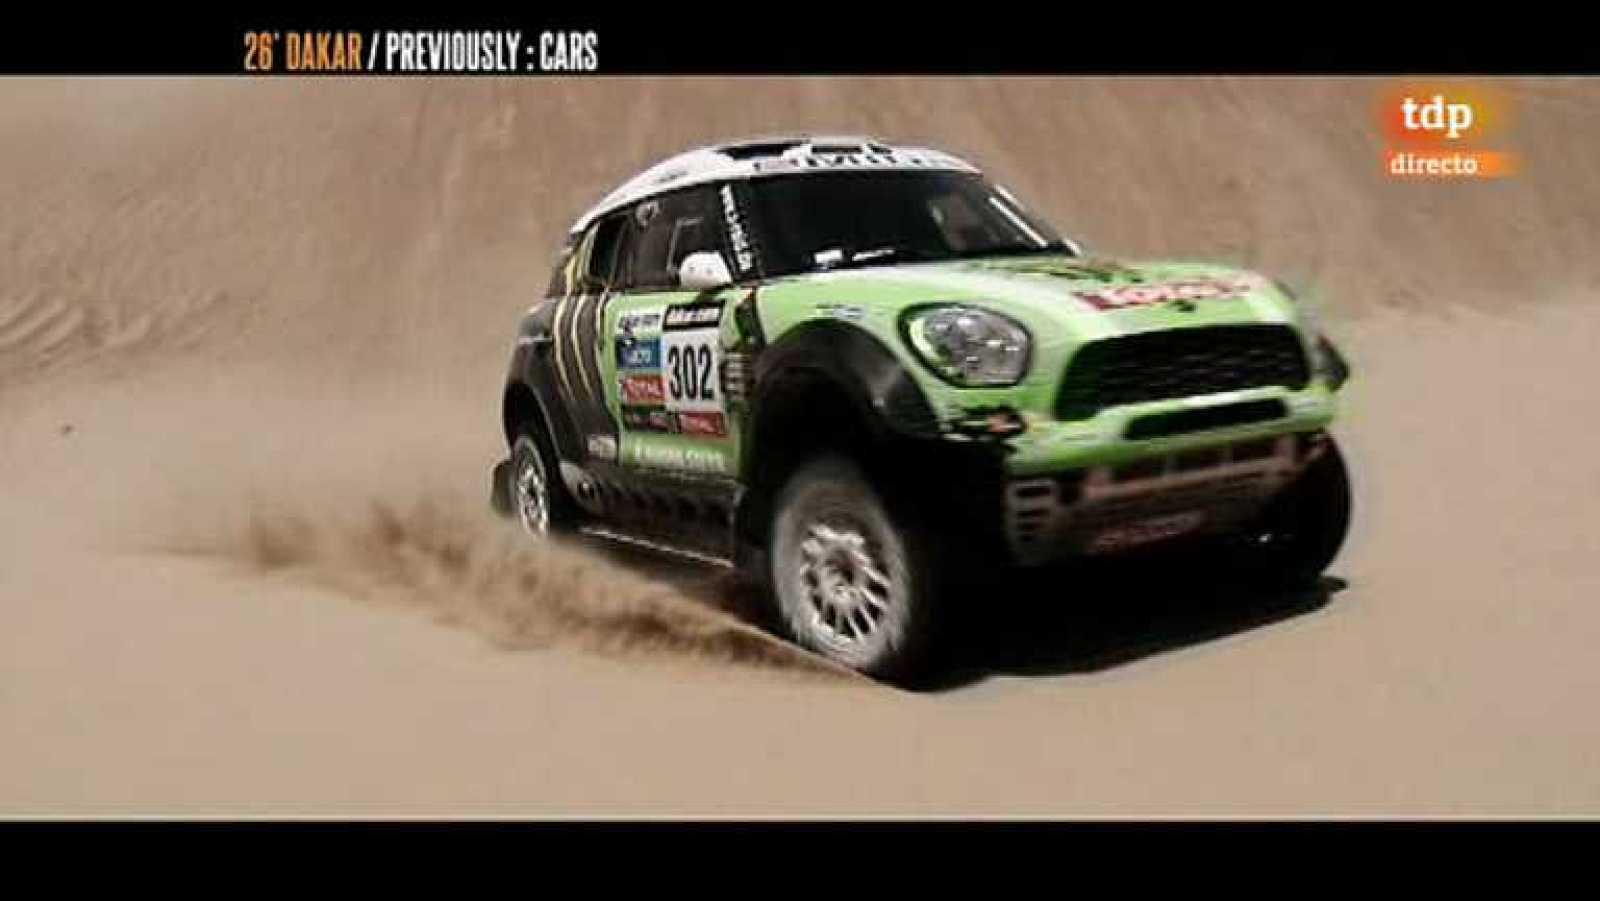 Rally Dakar 2013 - Etapa 4 (Nazca - Arequipa) - 08/01/13 - Ver ahora